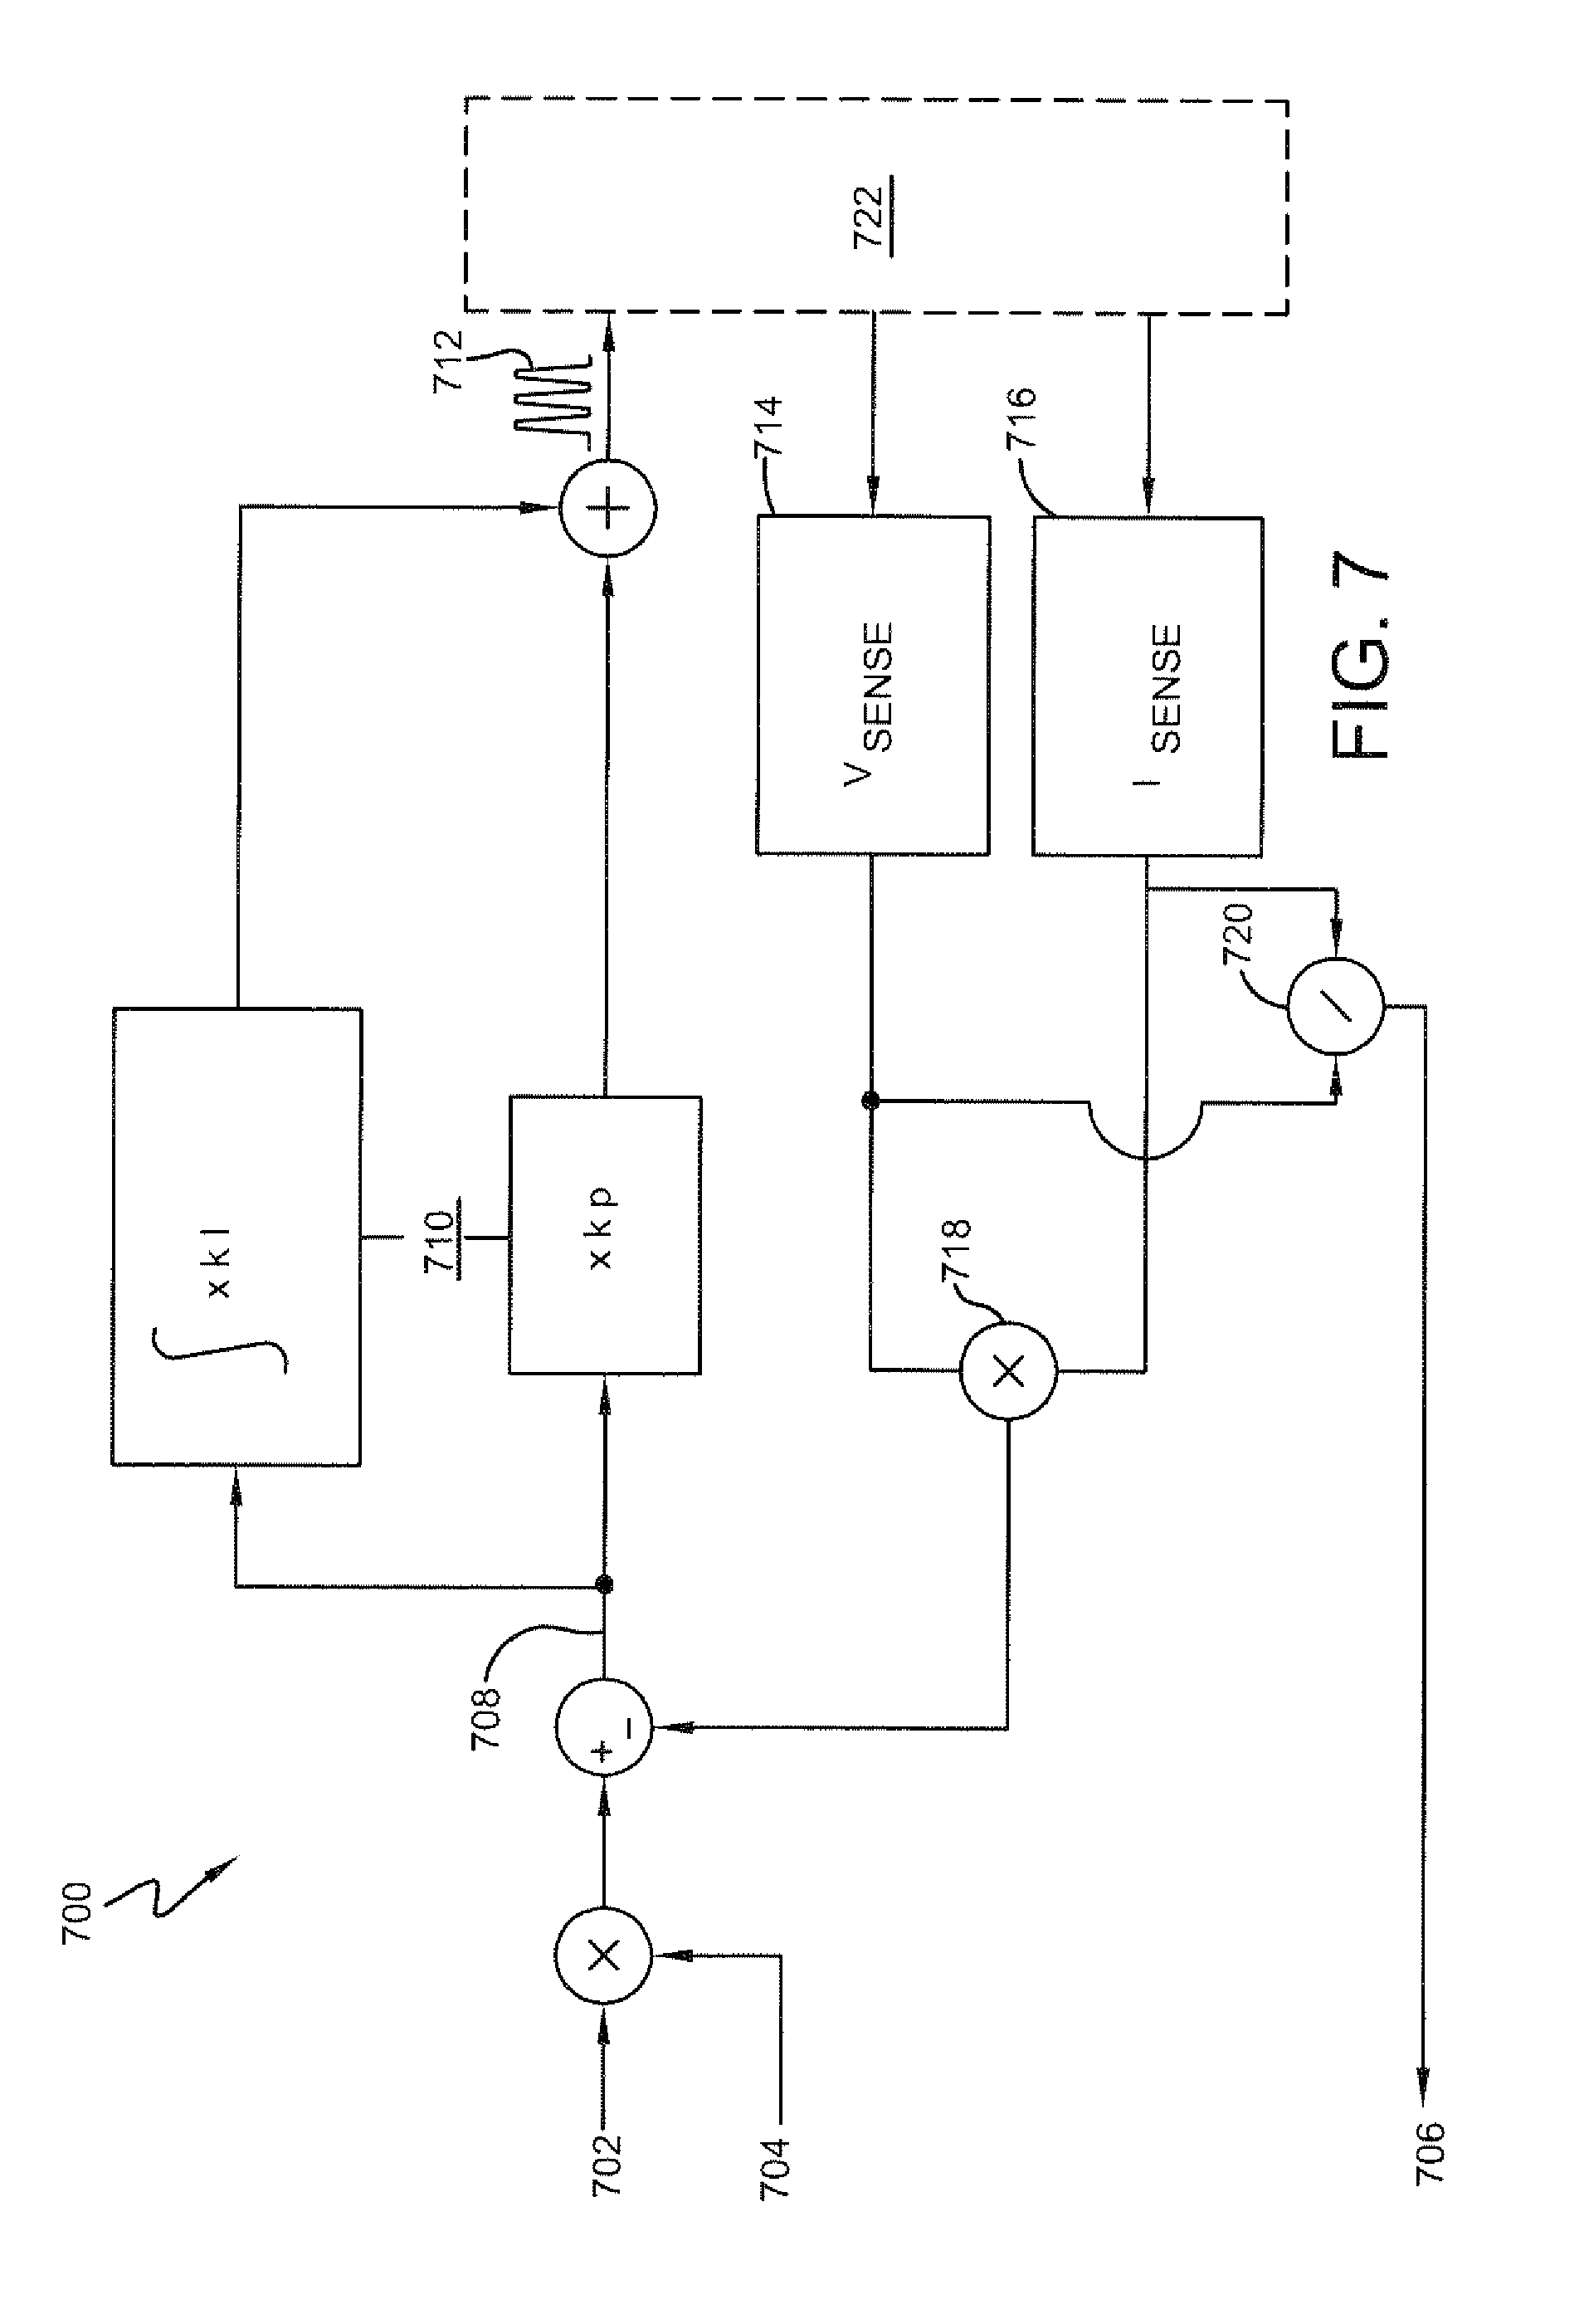 US20130104916A1 20130502 D00007 patent us20130104916 electronic vaporizer that simulates smoking vaporizer wiring diagram at bayanpartner.co